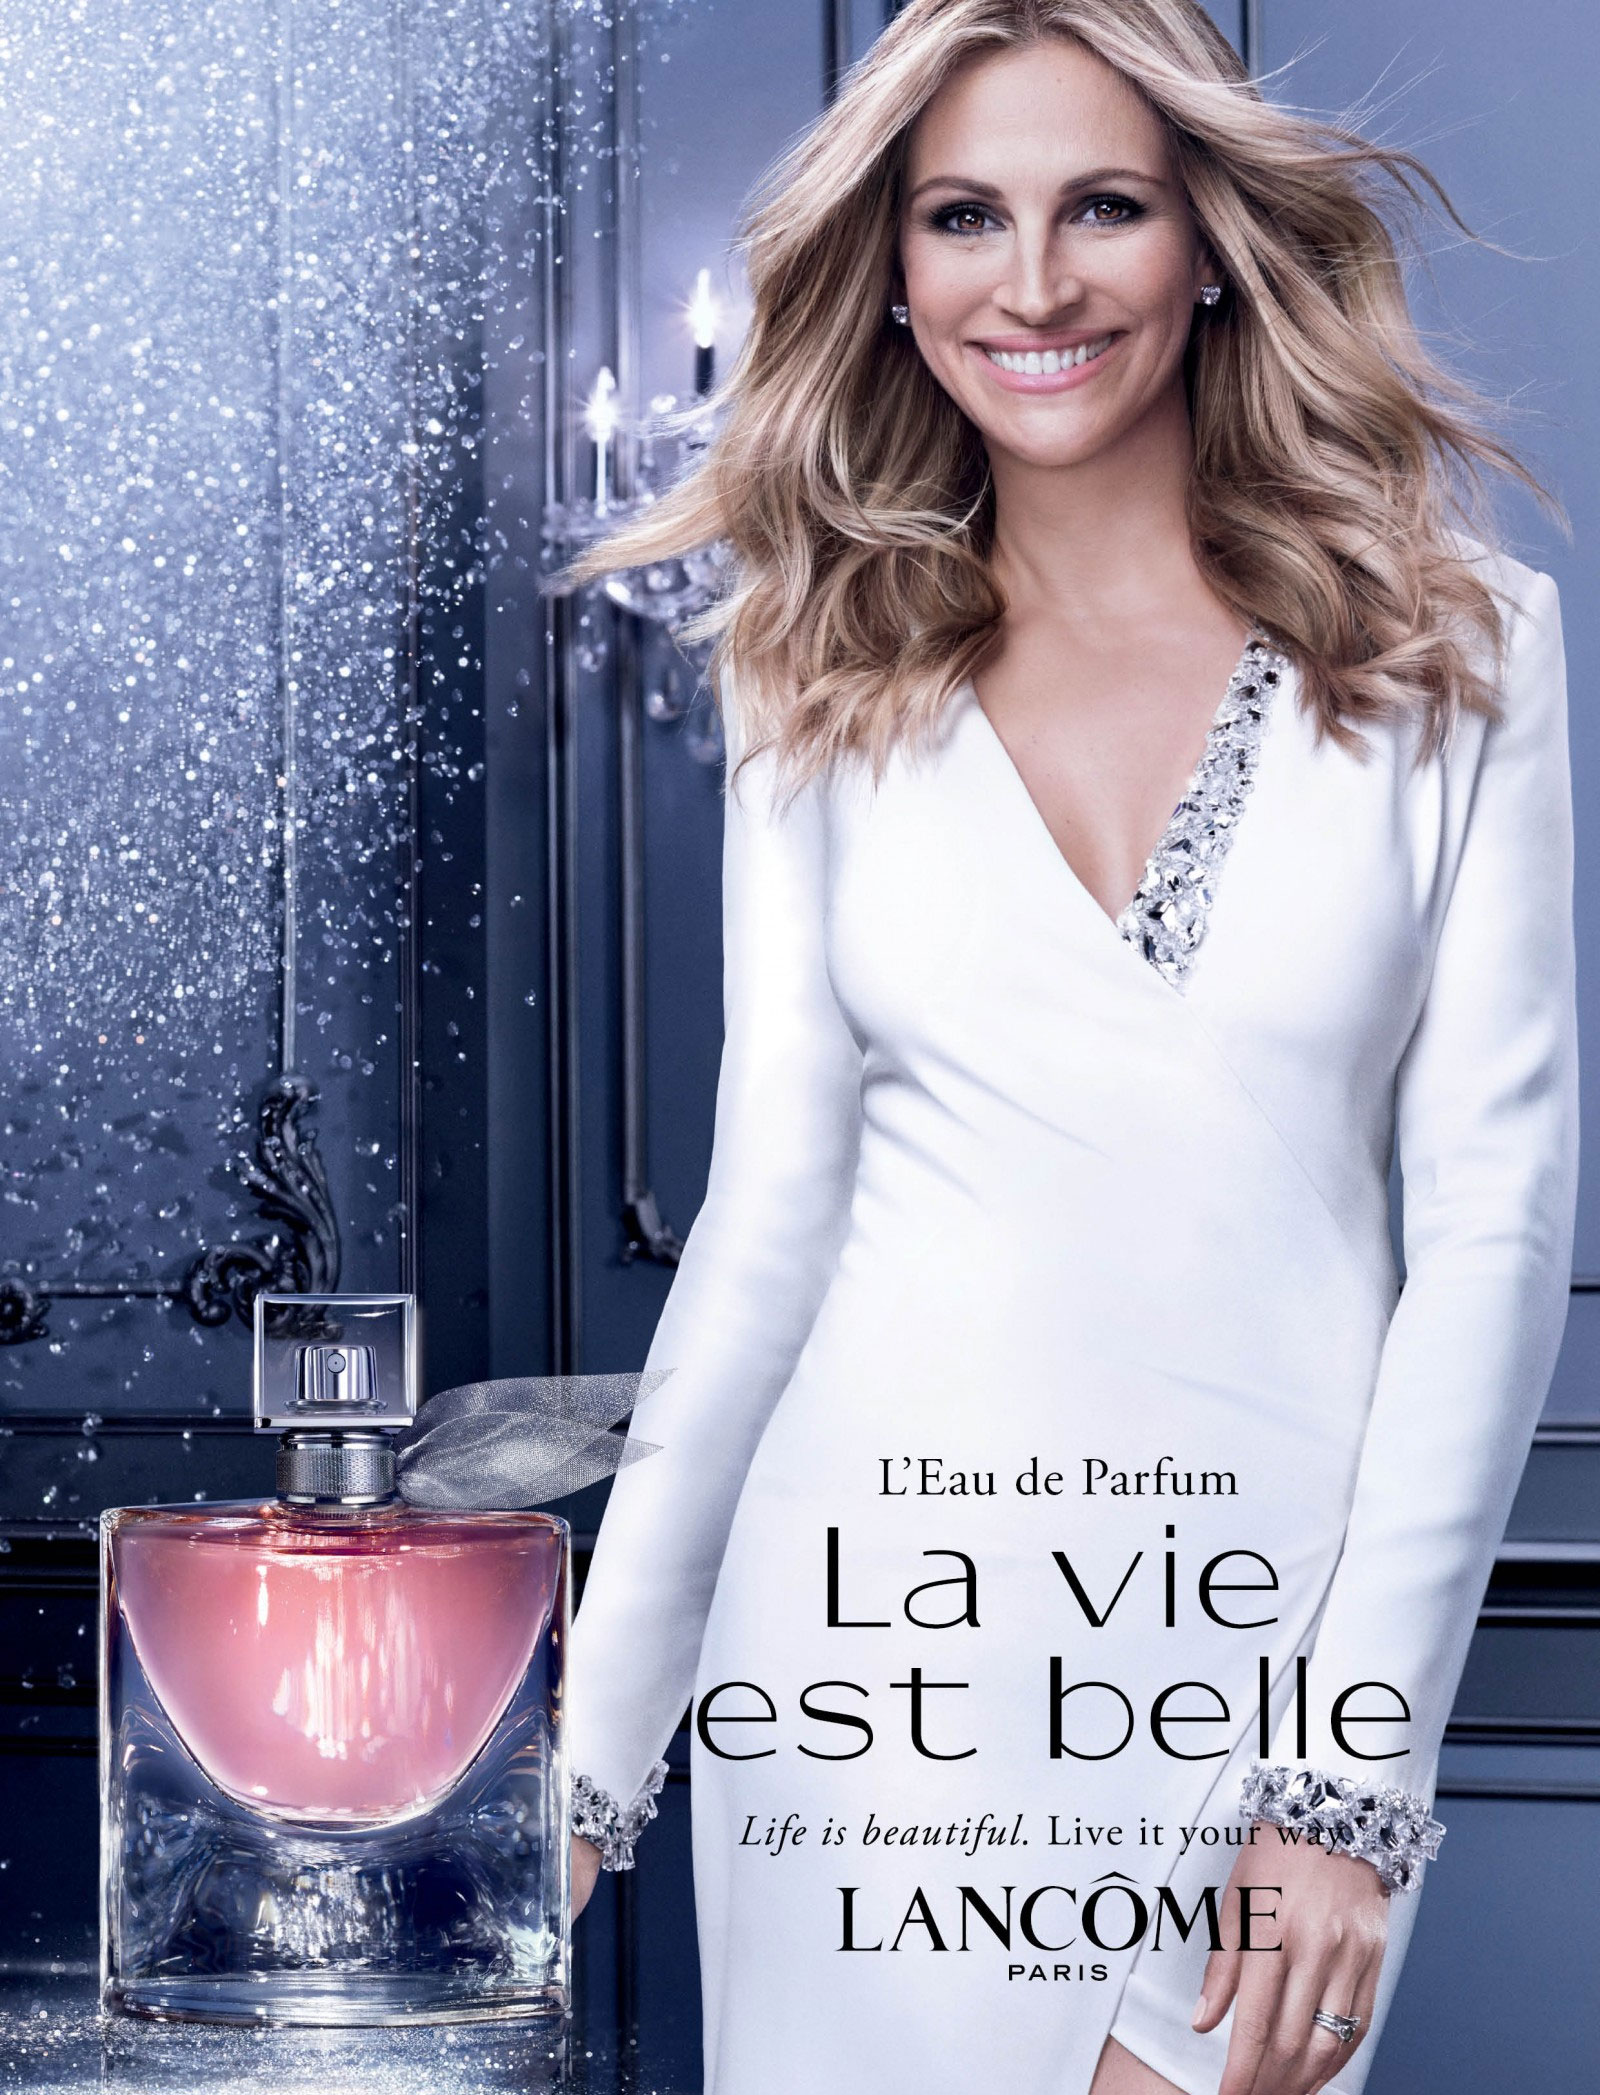 Resultado de imagem para julia roberts perfume campaign